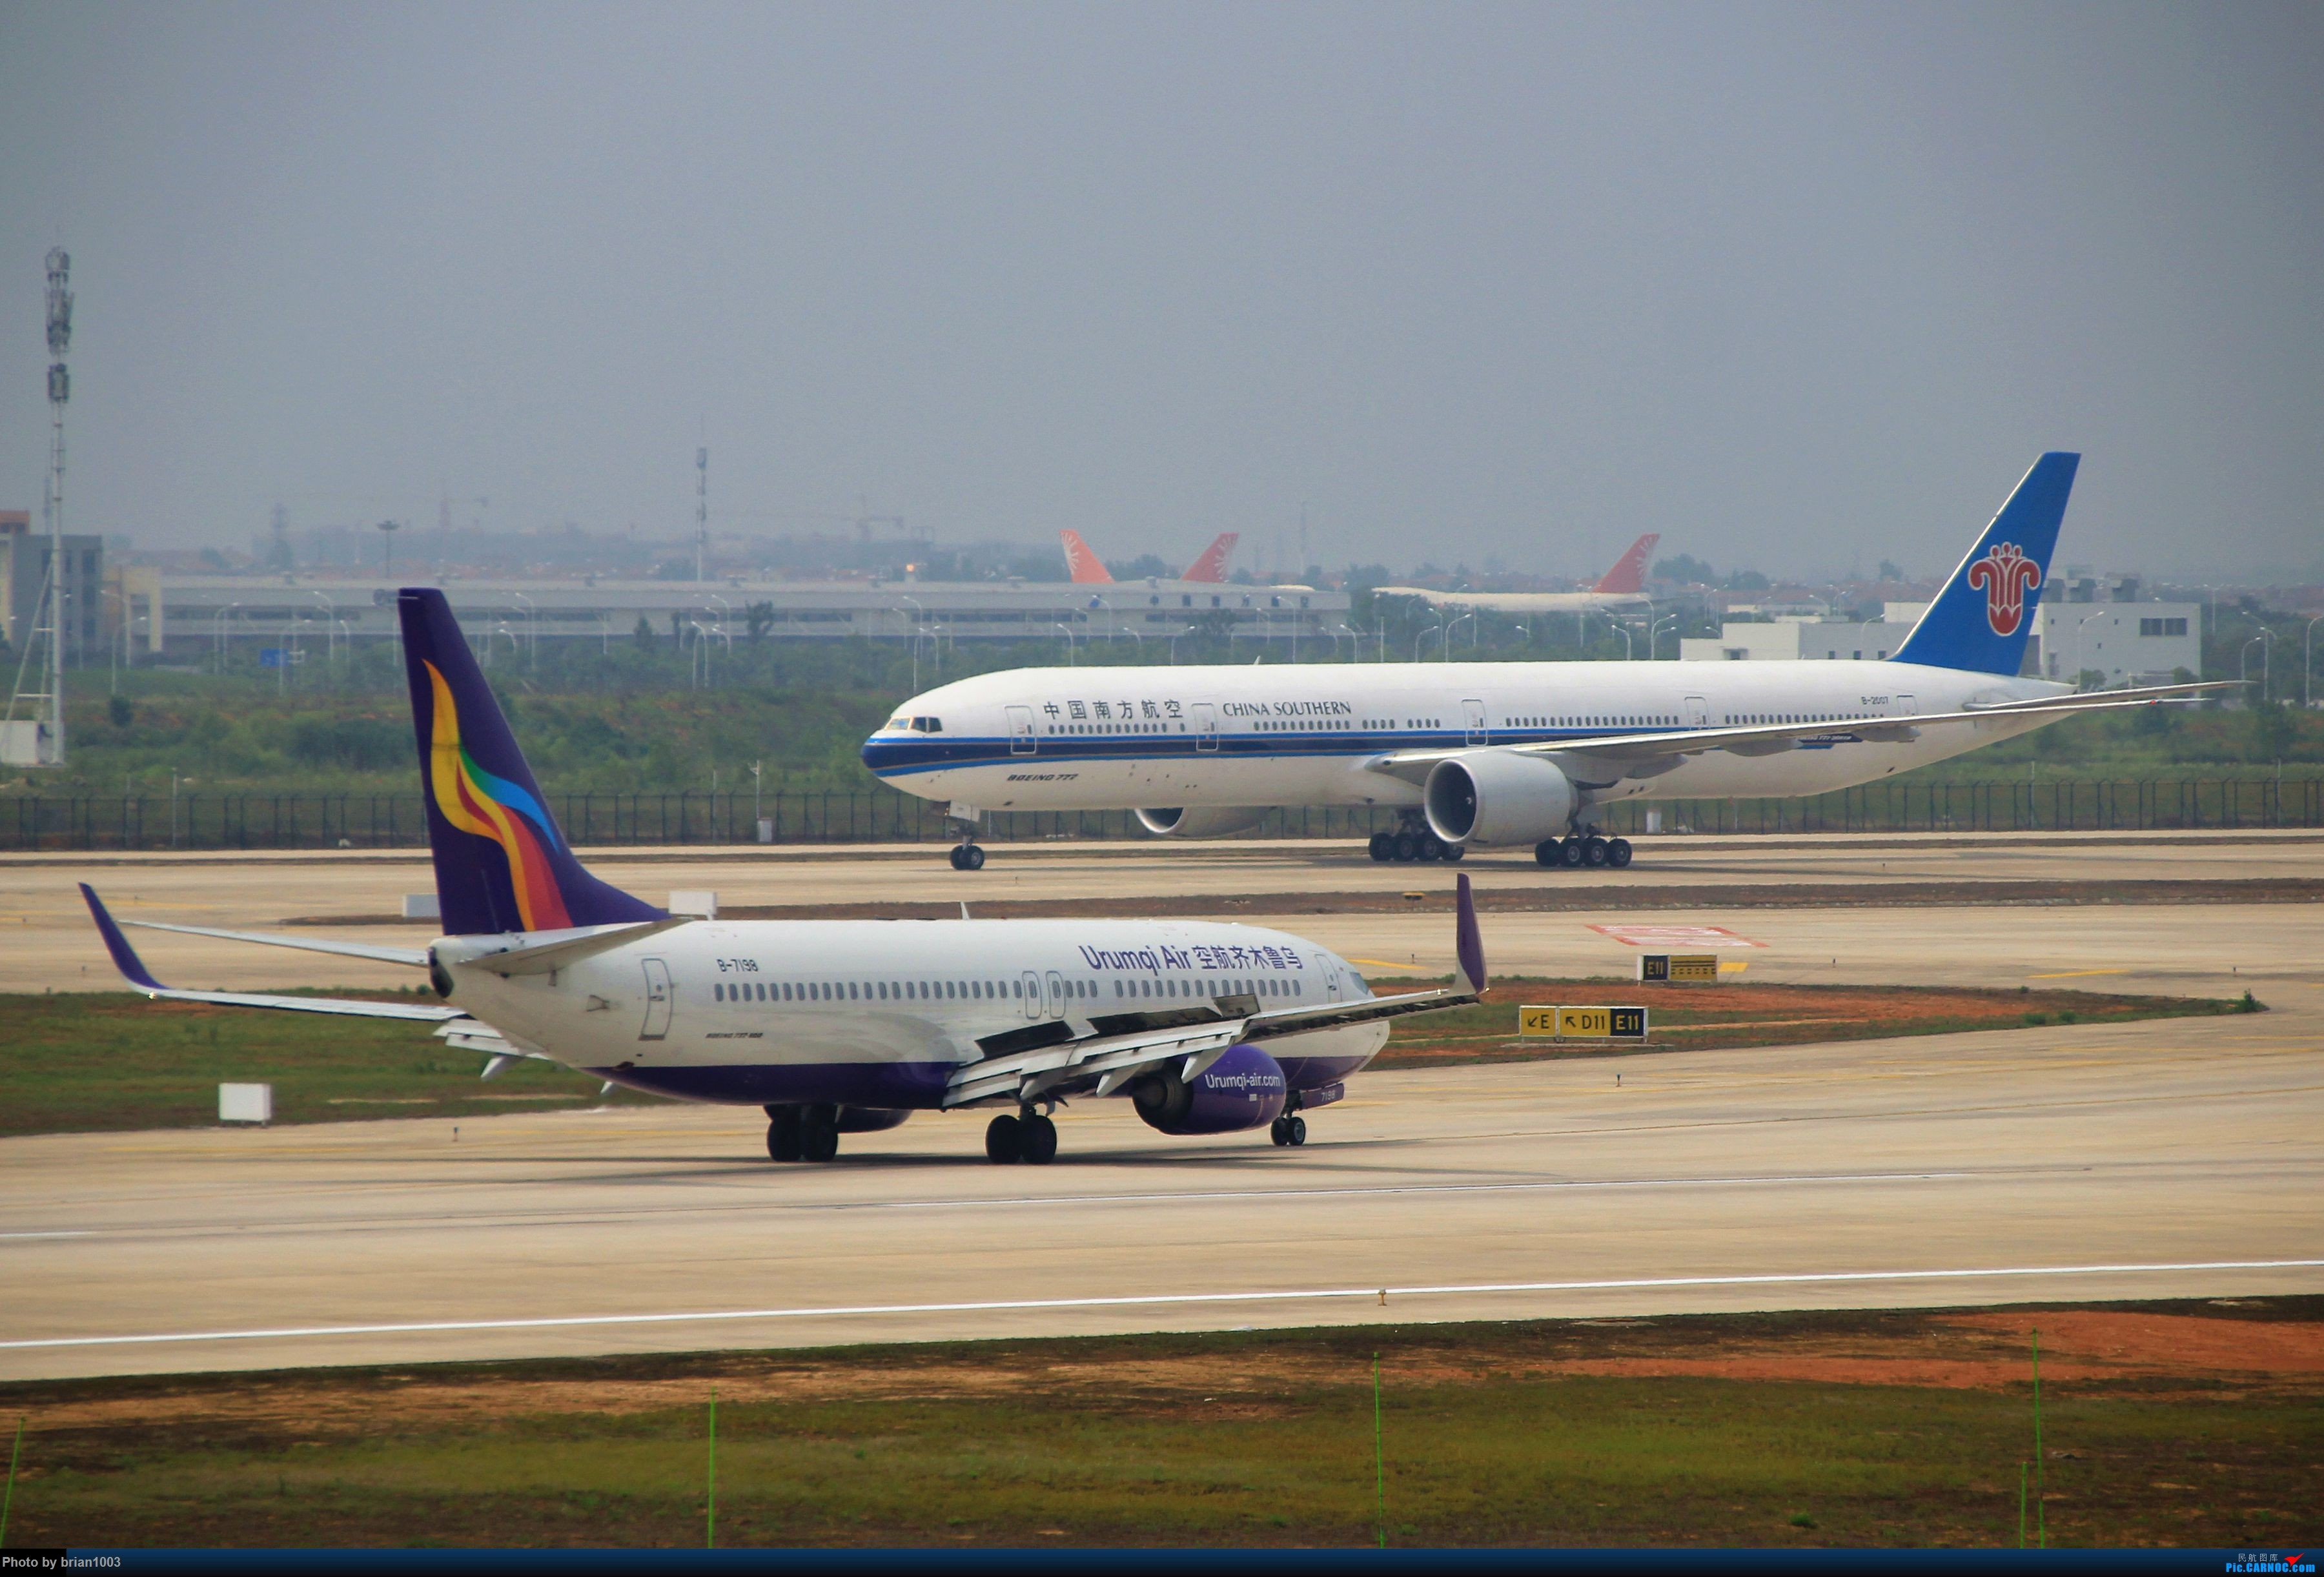 Re:[原创]WUH武汉天河机场拍机之二跑最后忙碌时 BOEING 737-800 B-7198 中国武汉天河国际机场